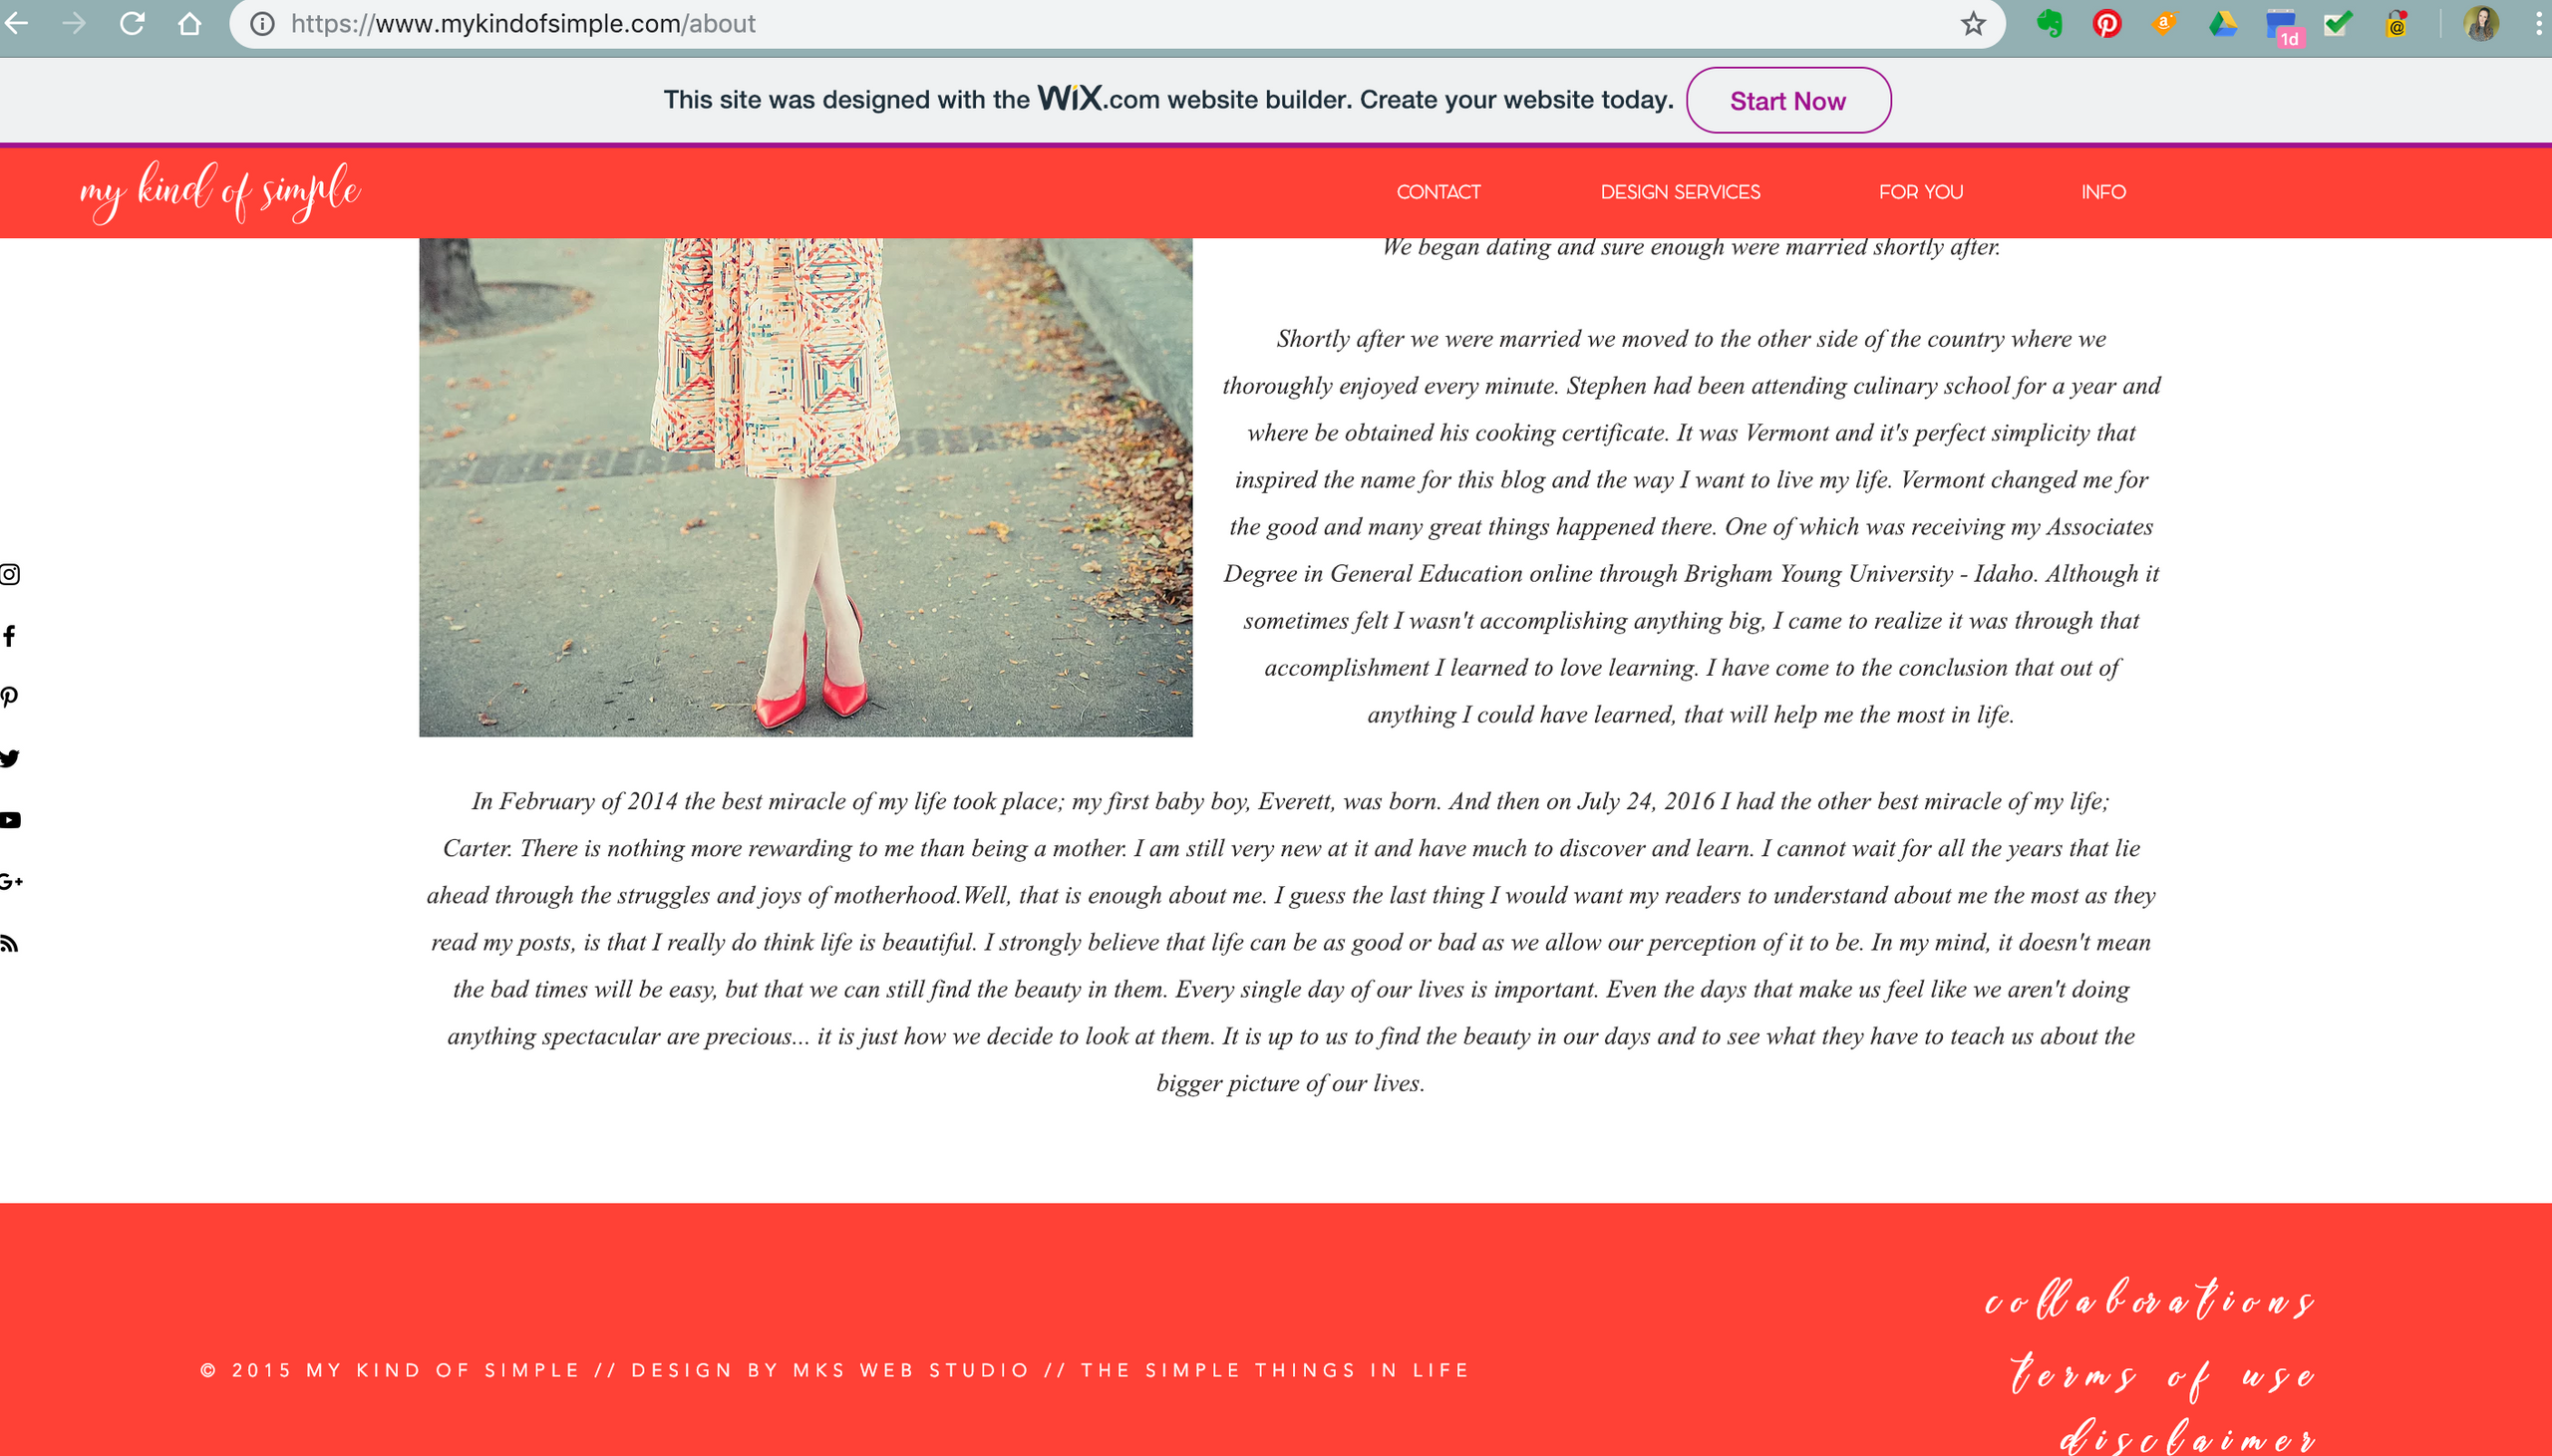 My Kind of Simple Blog Design